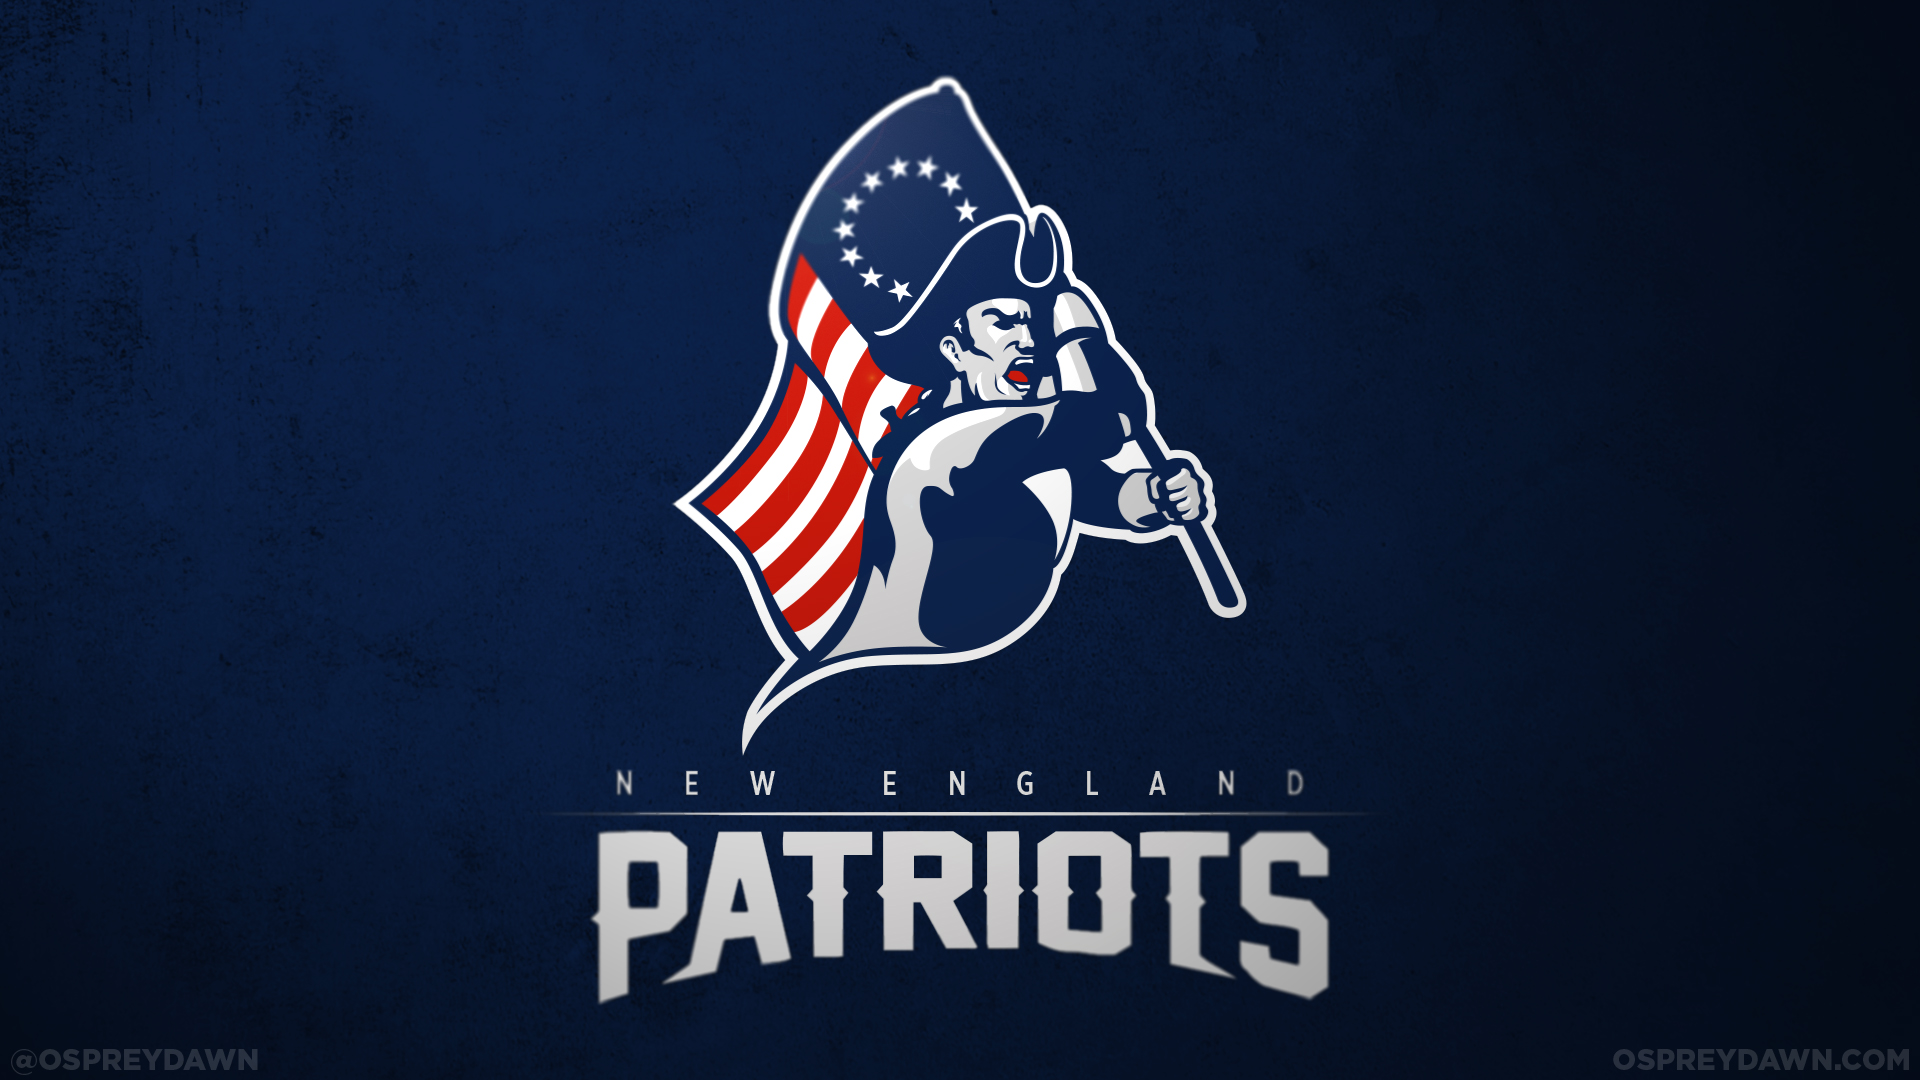 new england patriots logo wallpaper #30